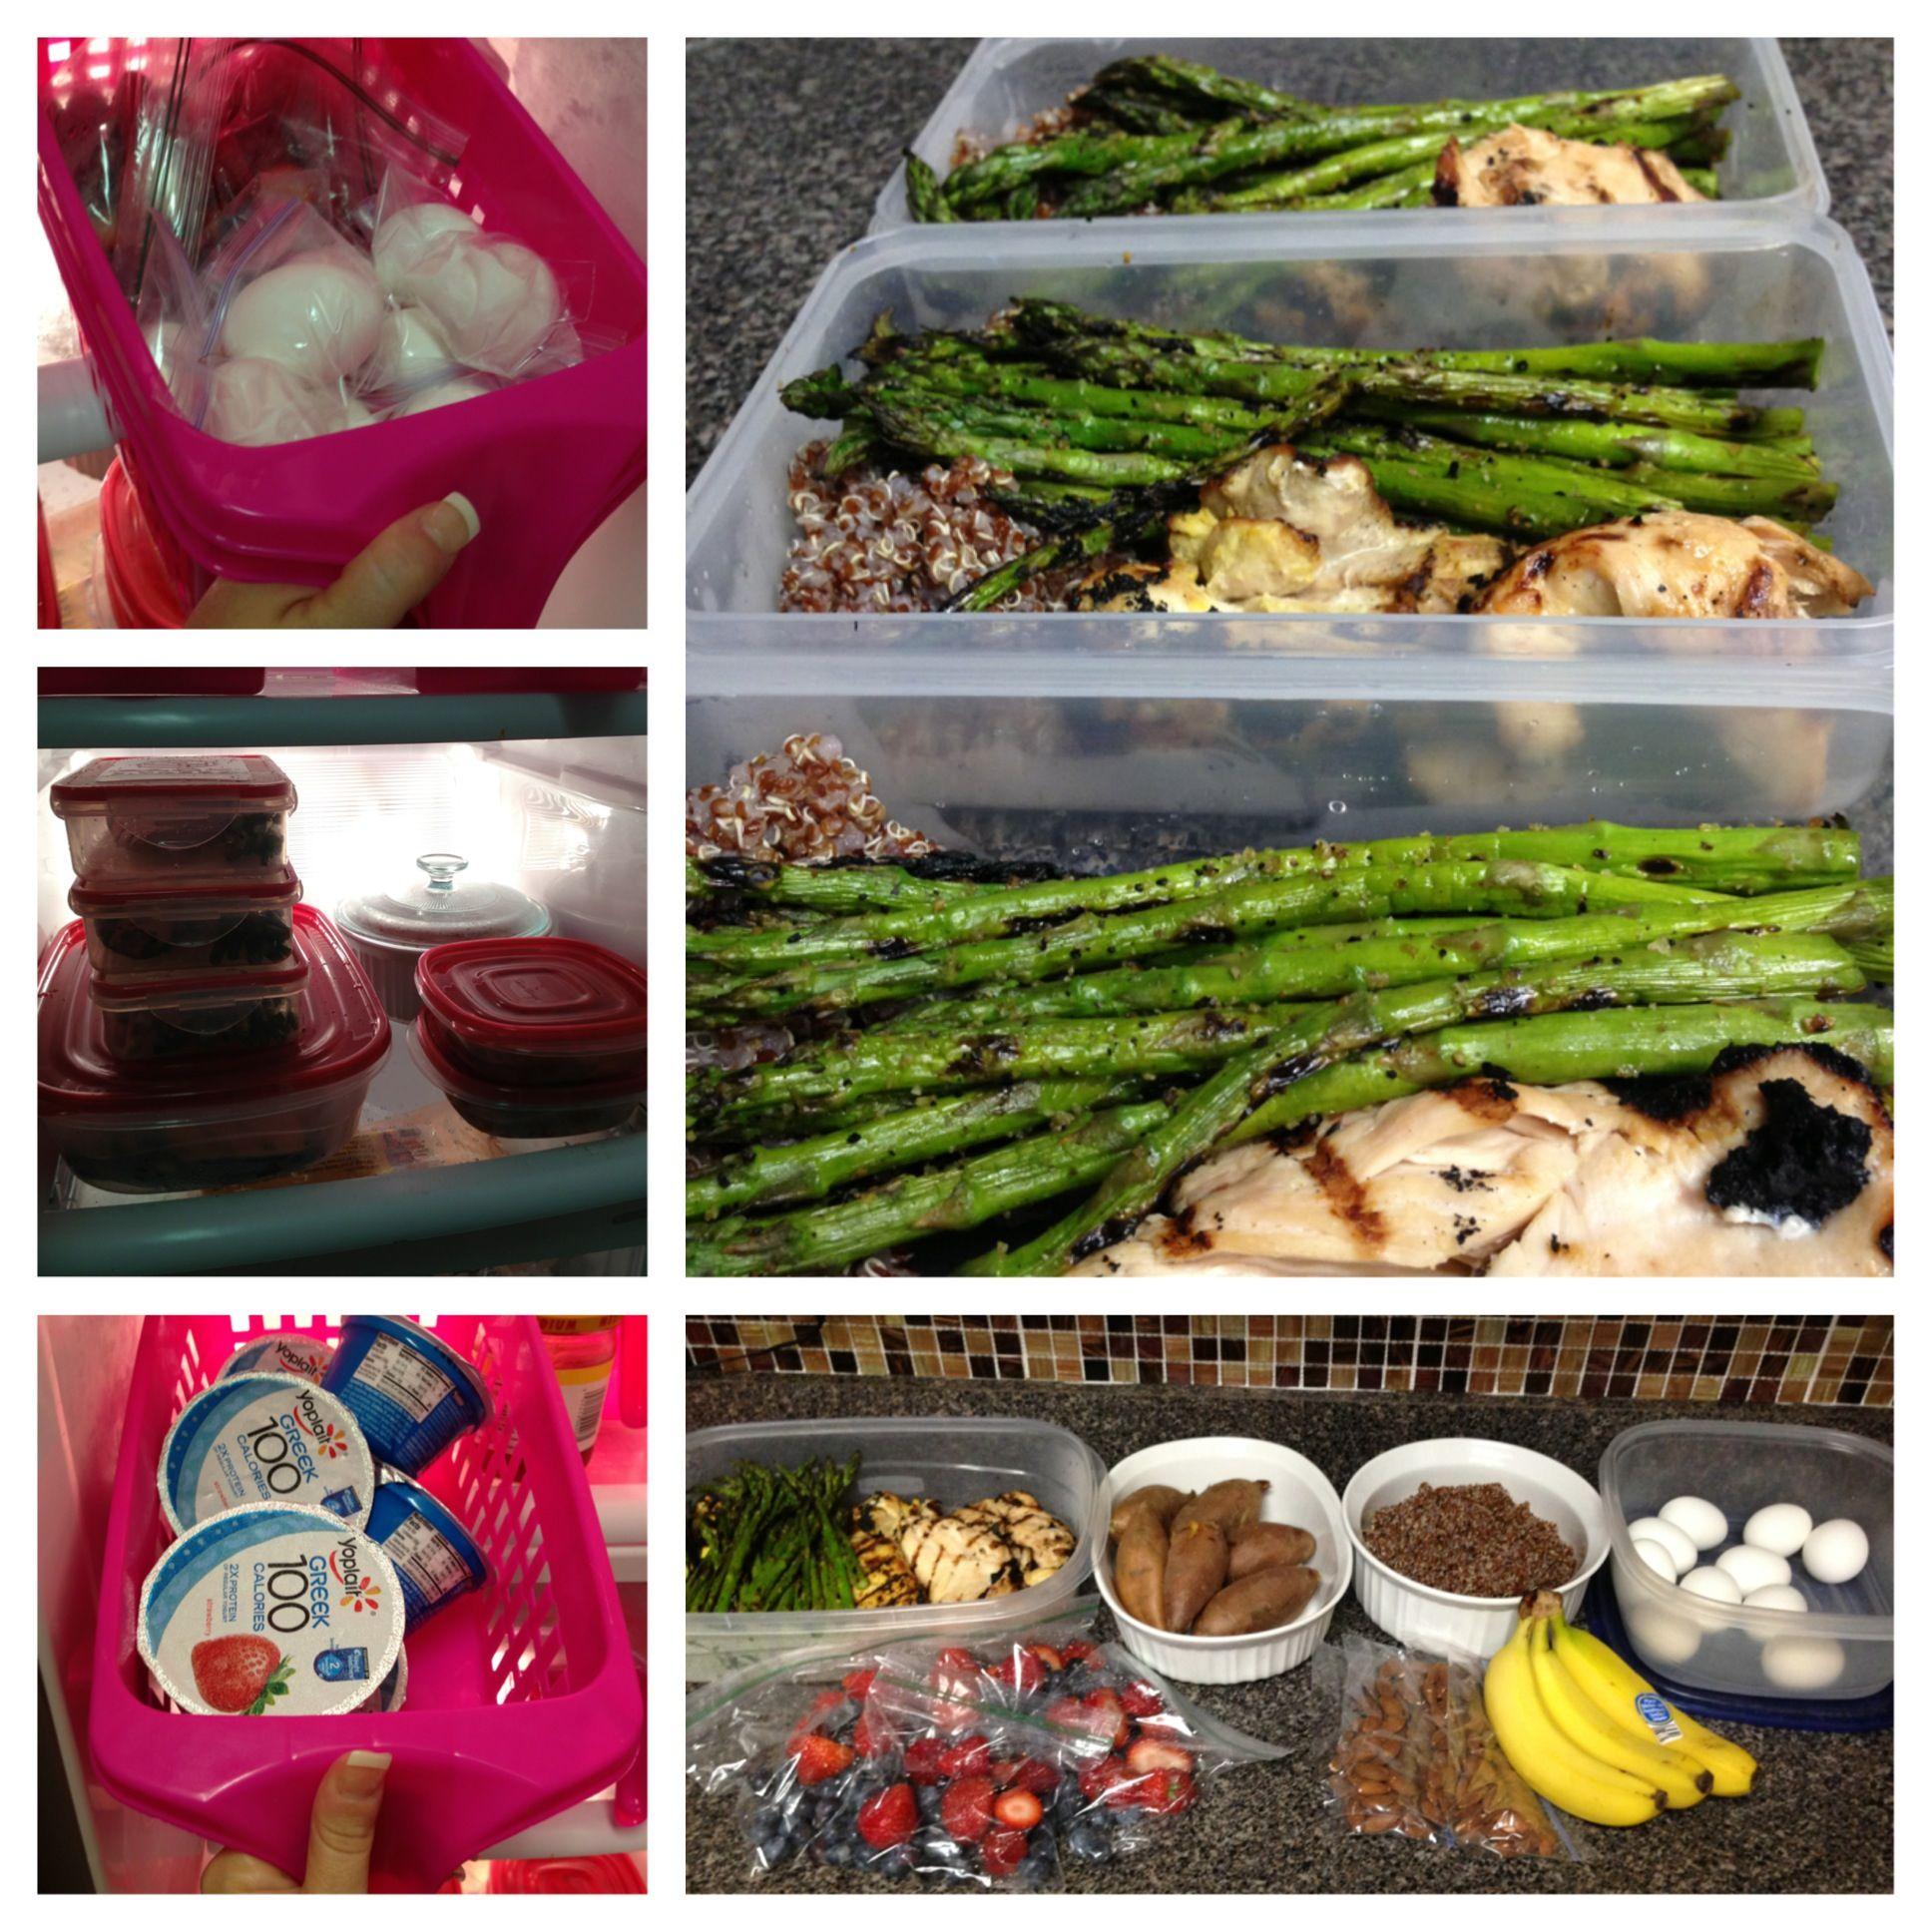 Clean meal prep. Chicken, asparagus, sweet taters, yogurt, boiled eggs,  banana, berries, granola. DO-ABLE! | Meal prep clean eating, Clean meal  prep, Workout food